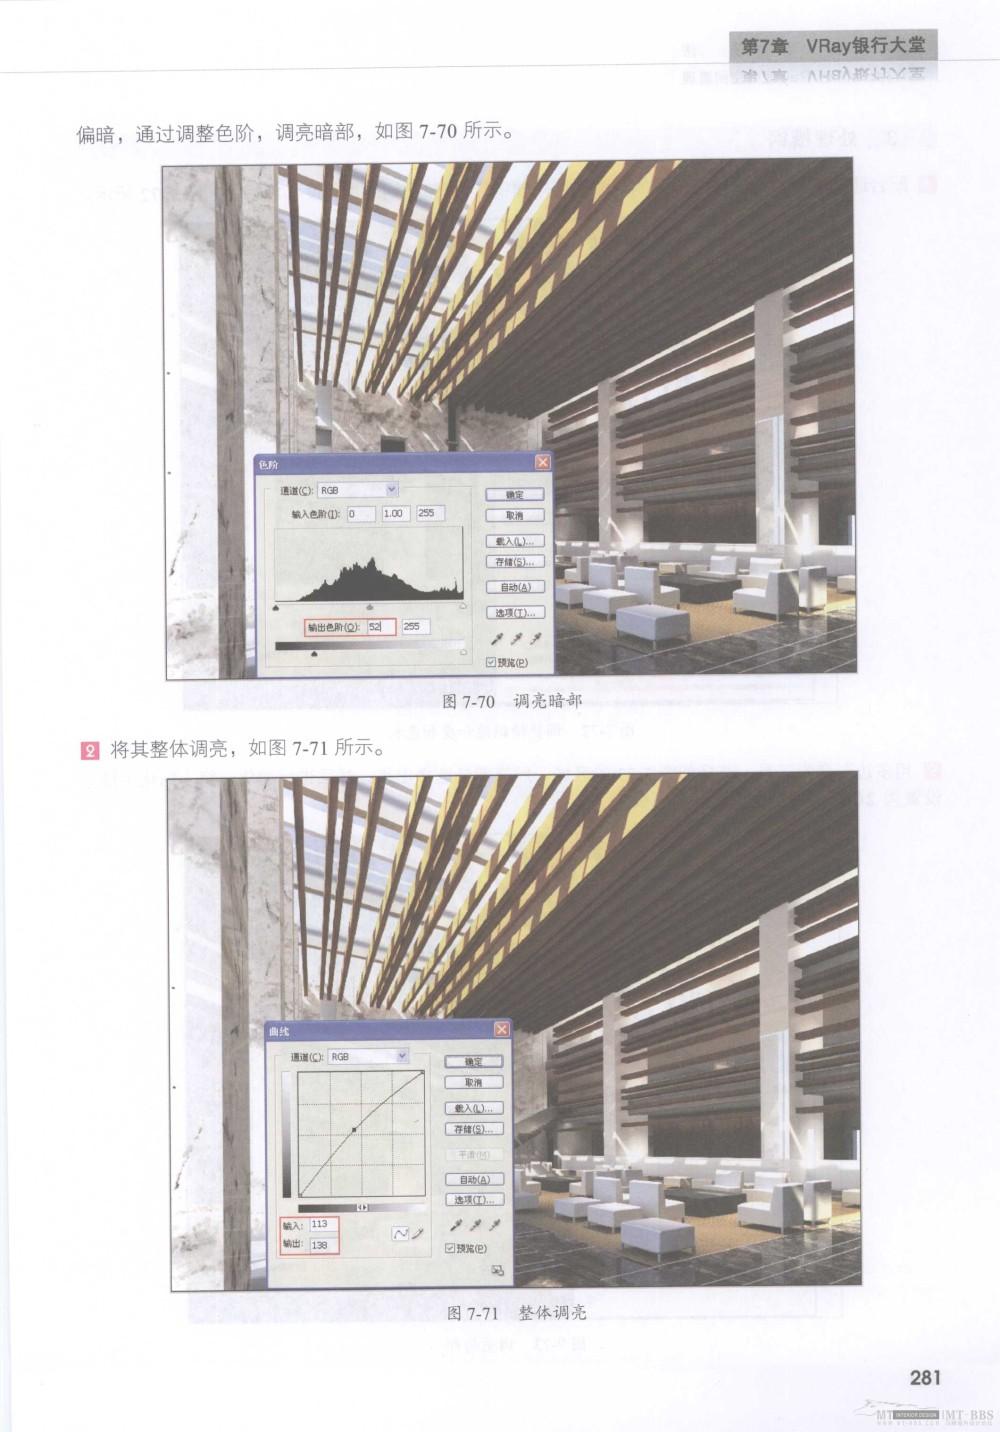 水晶石技法-3ds_Max&VRay室内空间表现_水晶石技法-3ds_Max&VRay室内空间表现_页面_287.jpg